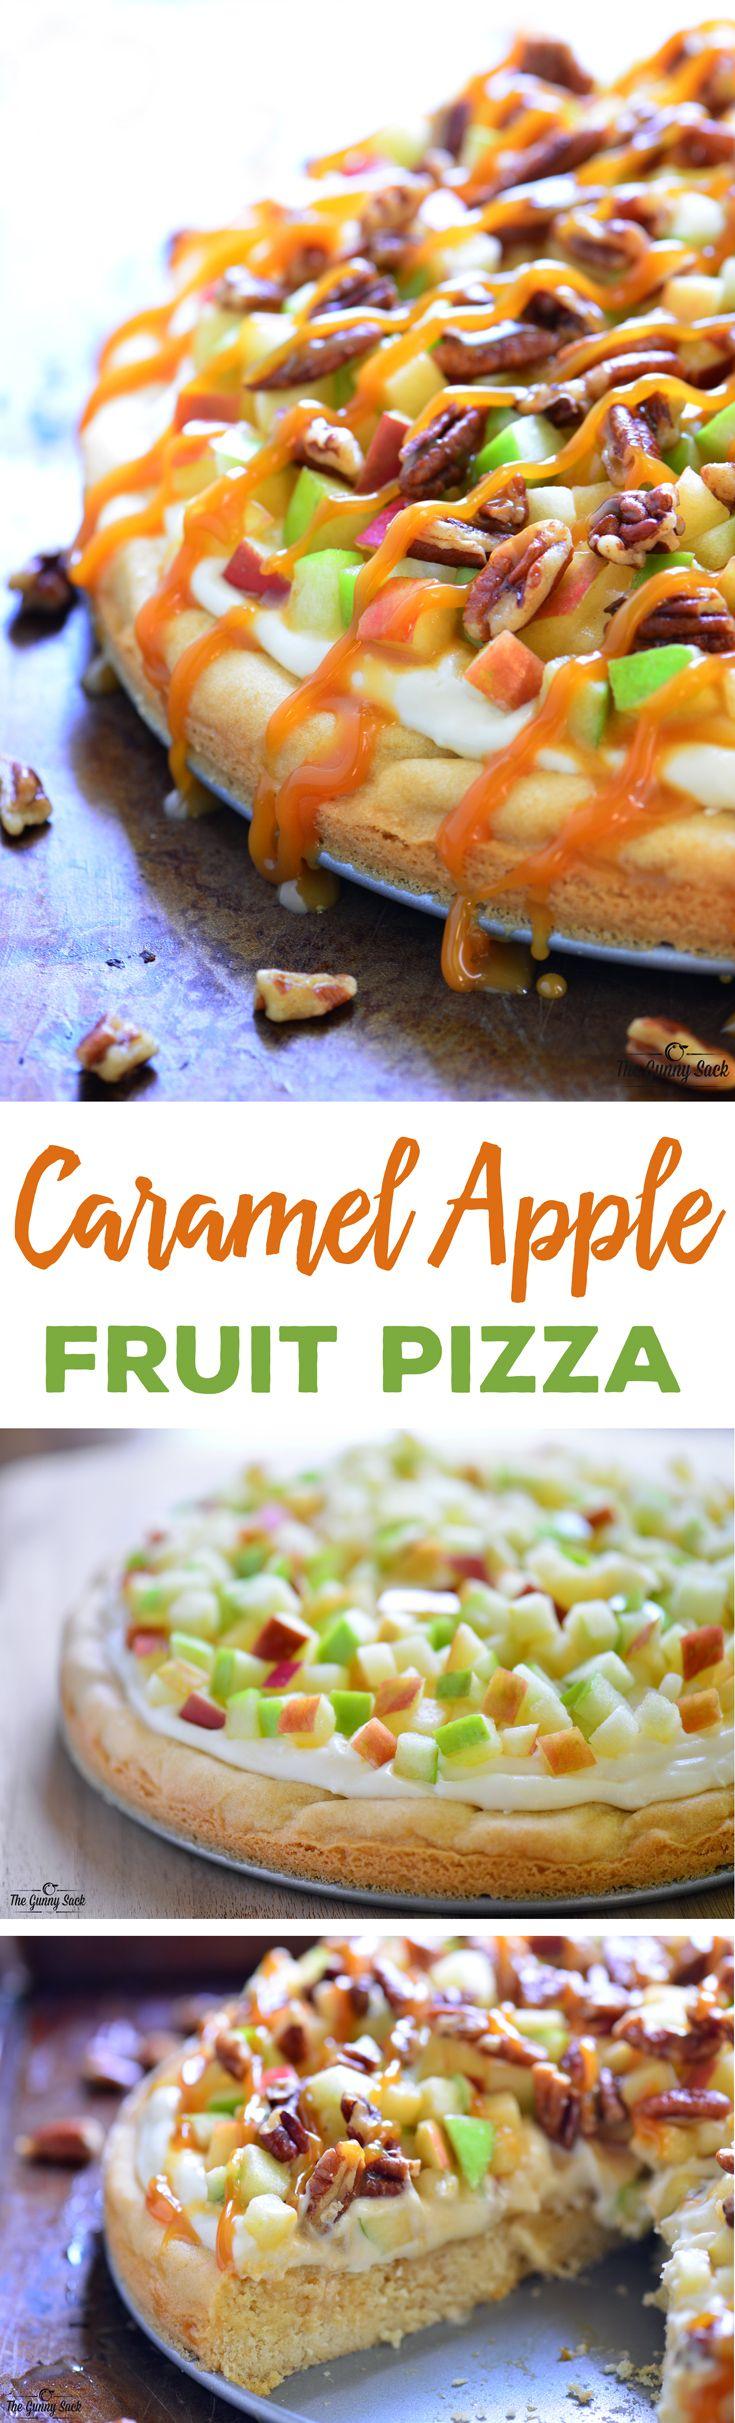 Caramel Apple Fruit Pizza - The Gunny Sack #falldesserts